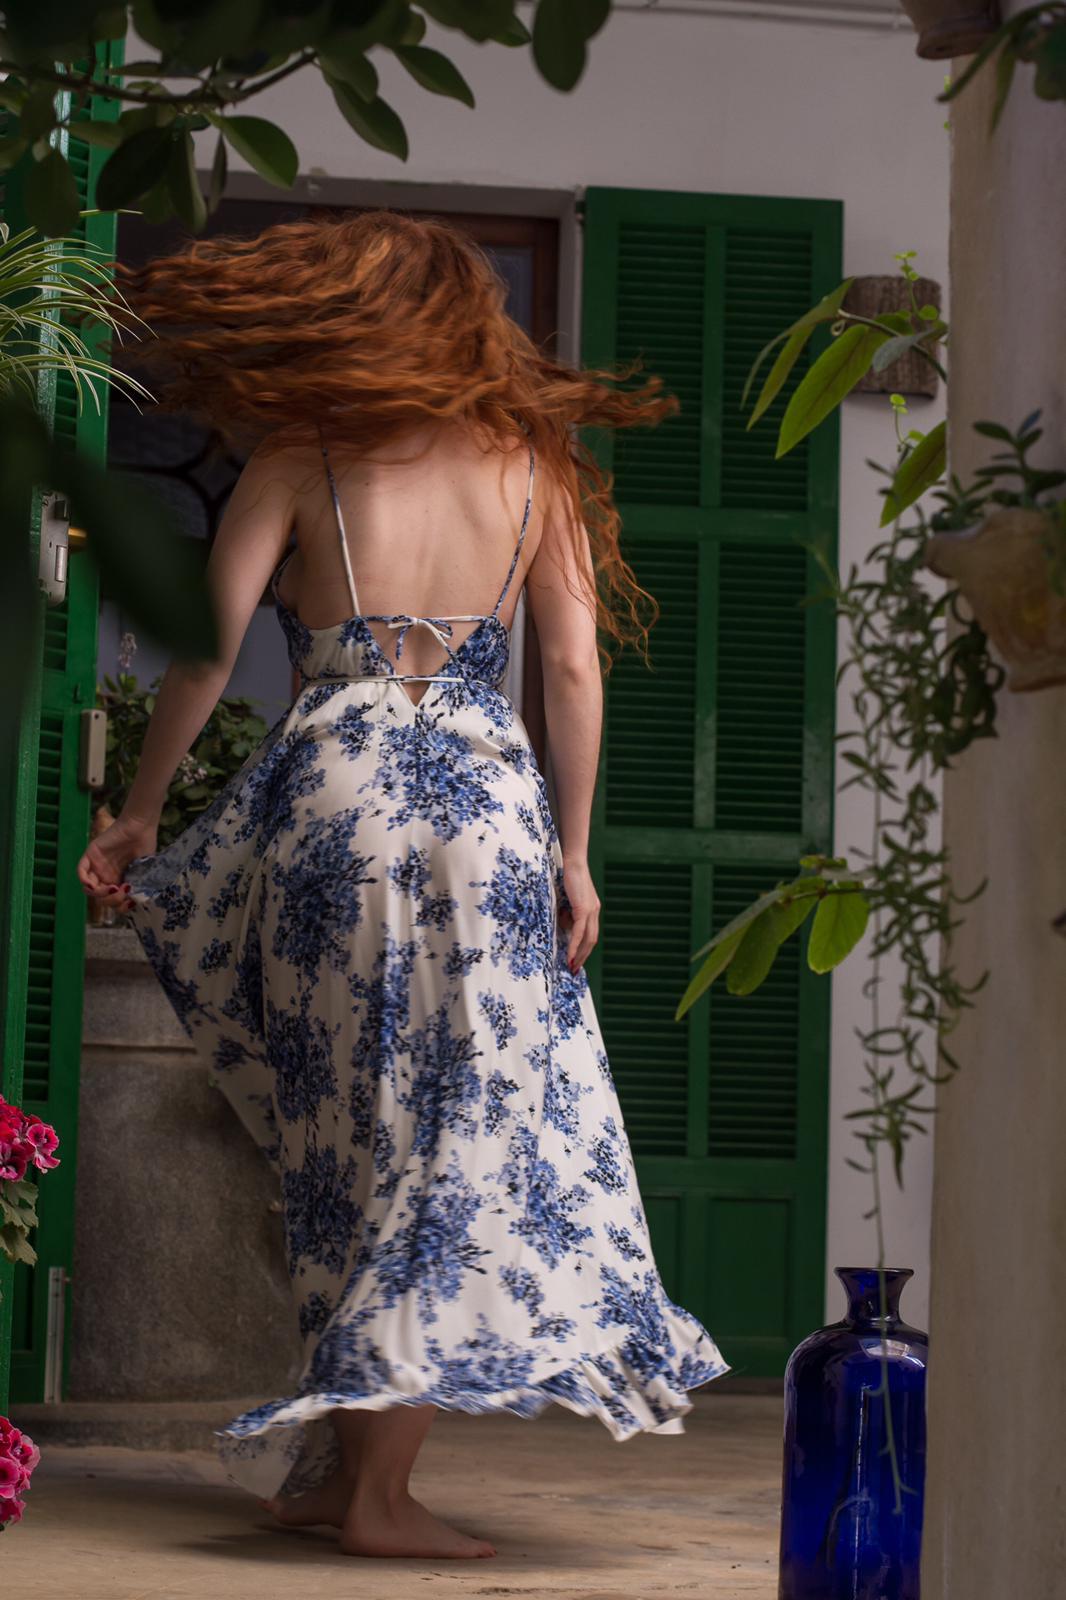 carolina.albertoni.mallorca.handmade.dresses.soft.sensual.feminity.designer.women